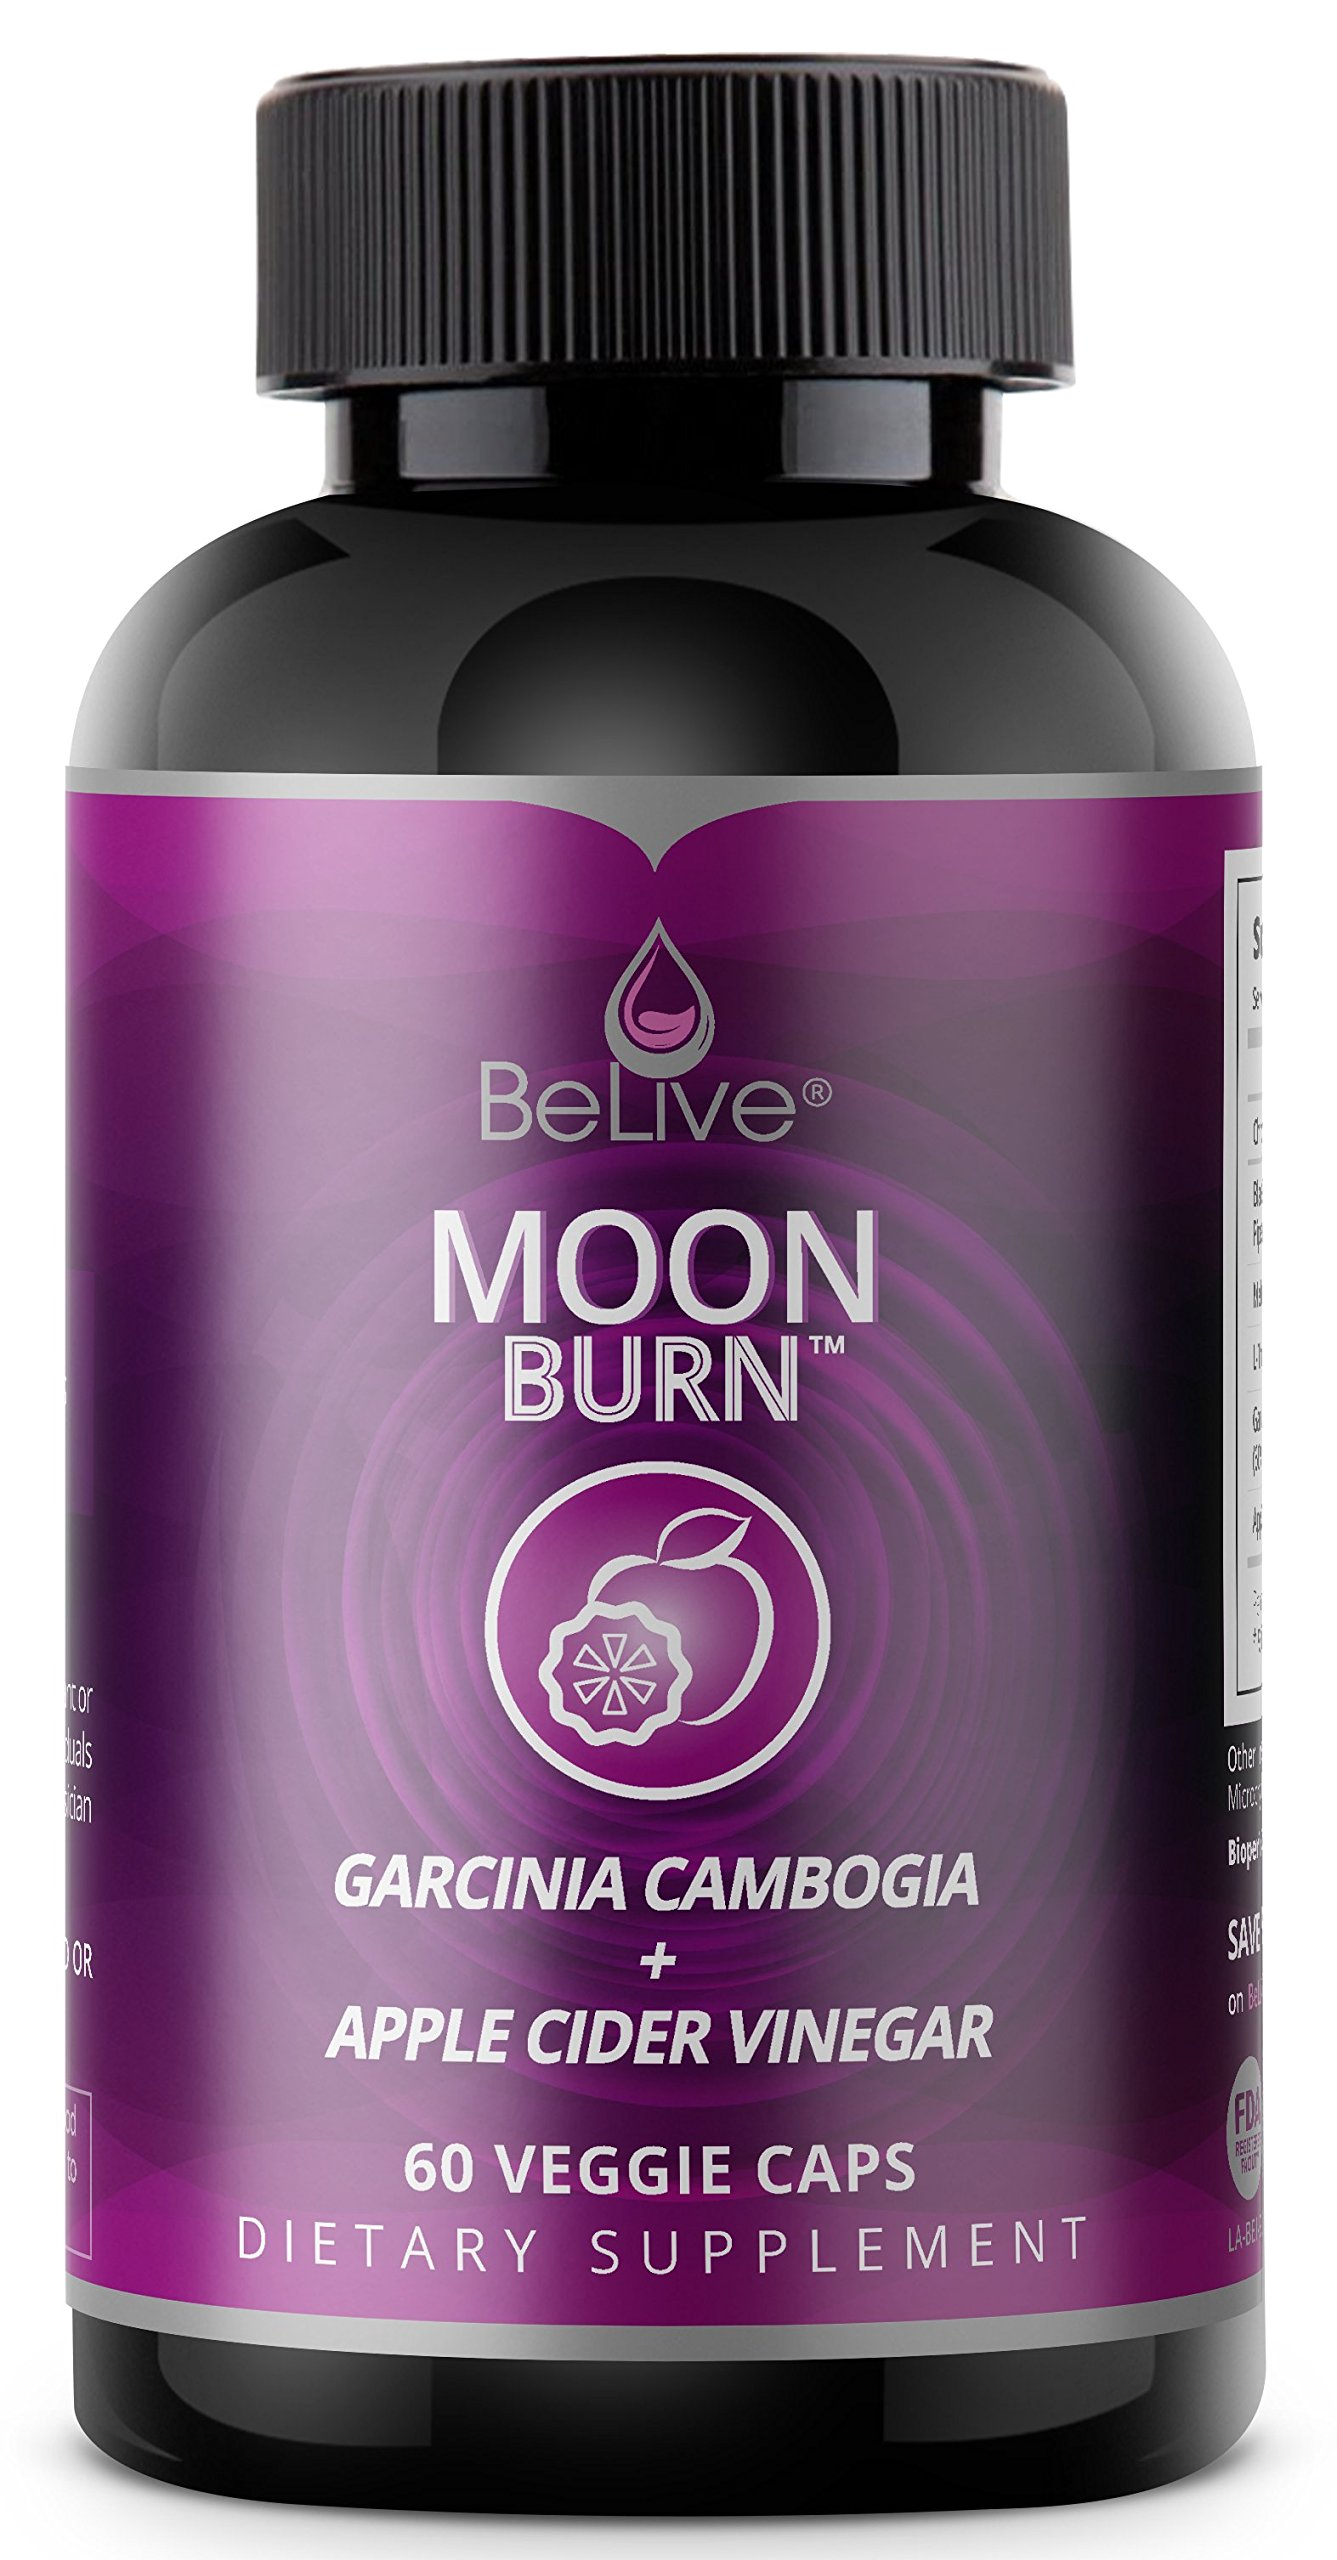 Apple Cider Vinegar & Garcinia Cambogia Weight Loss Pills for Women and Men. Sleep Aid Supplement, Stimulant-Free, Premium Carb Blocker & Appetite Control Fat Burner – MoonBurn 60 V-Caps